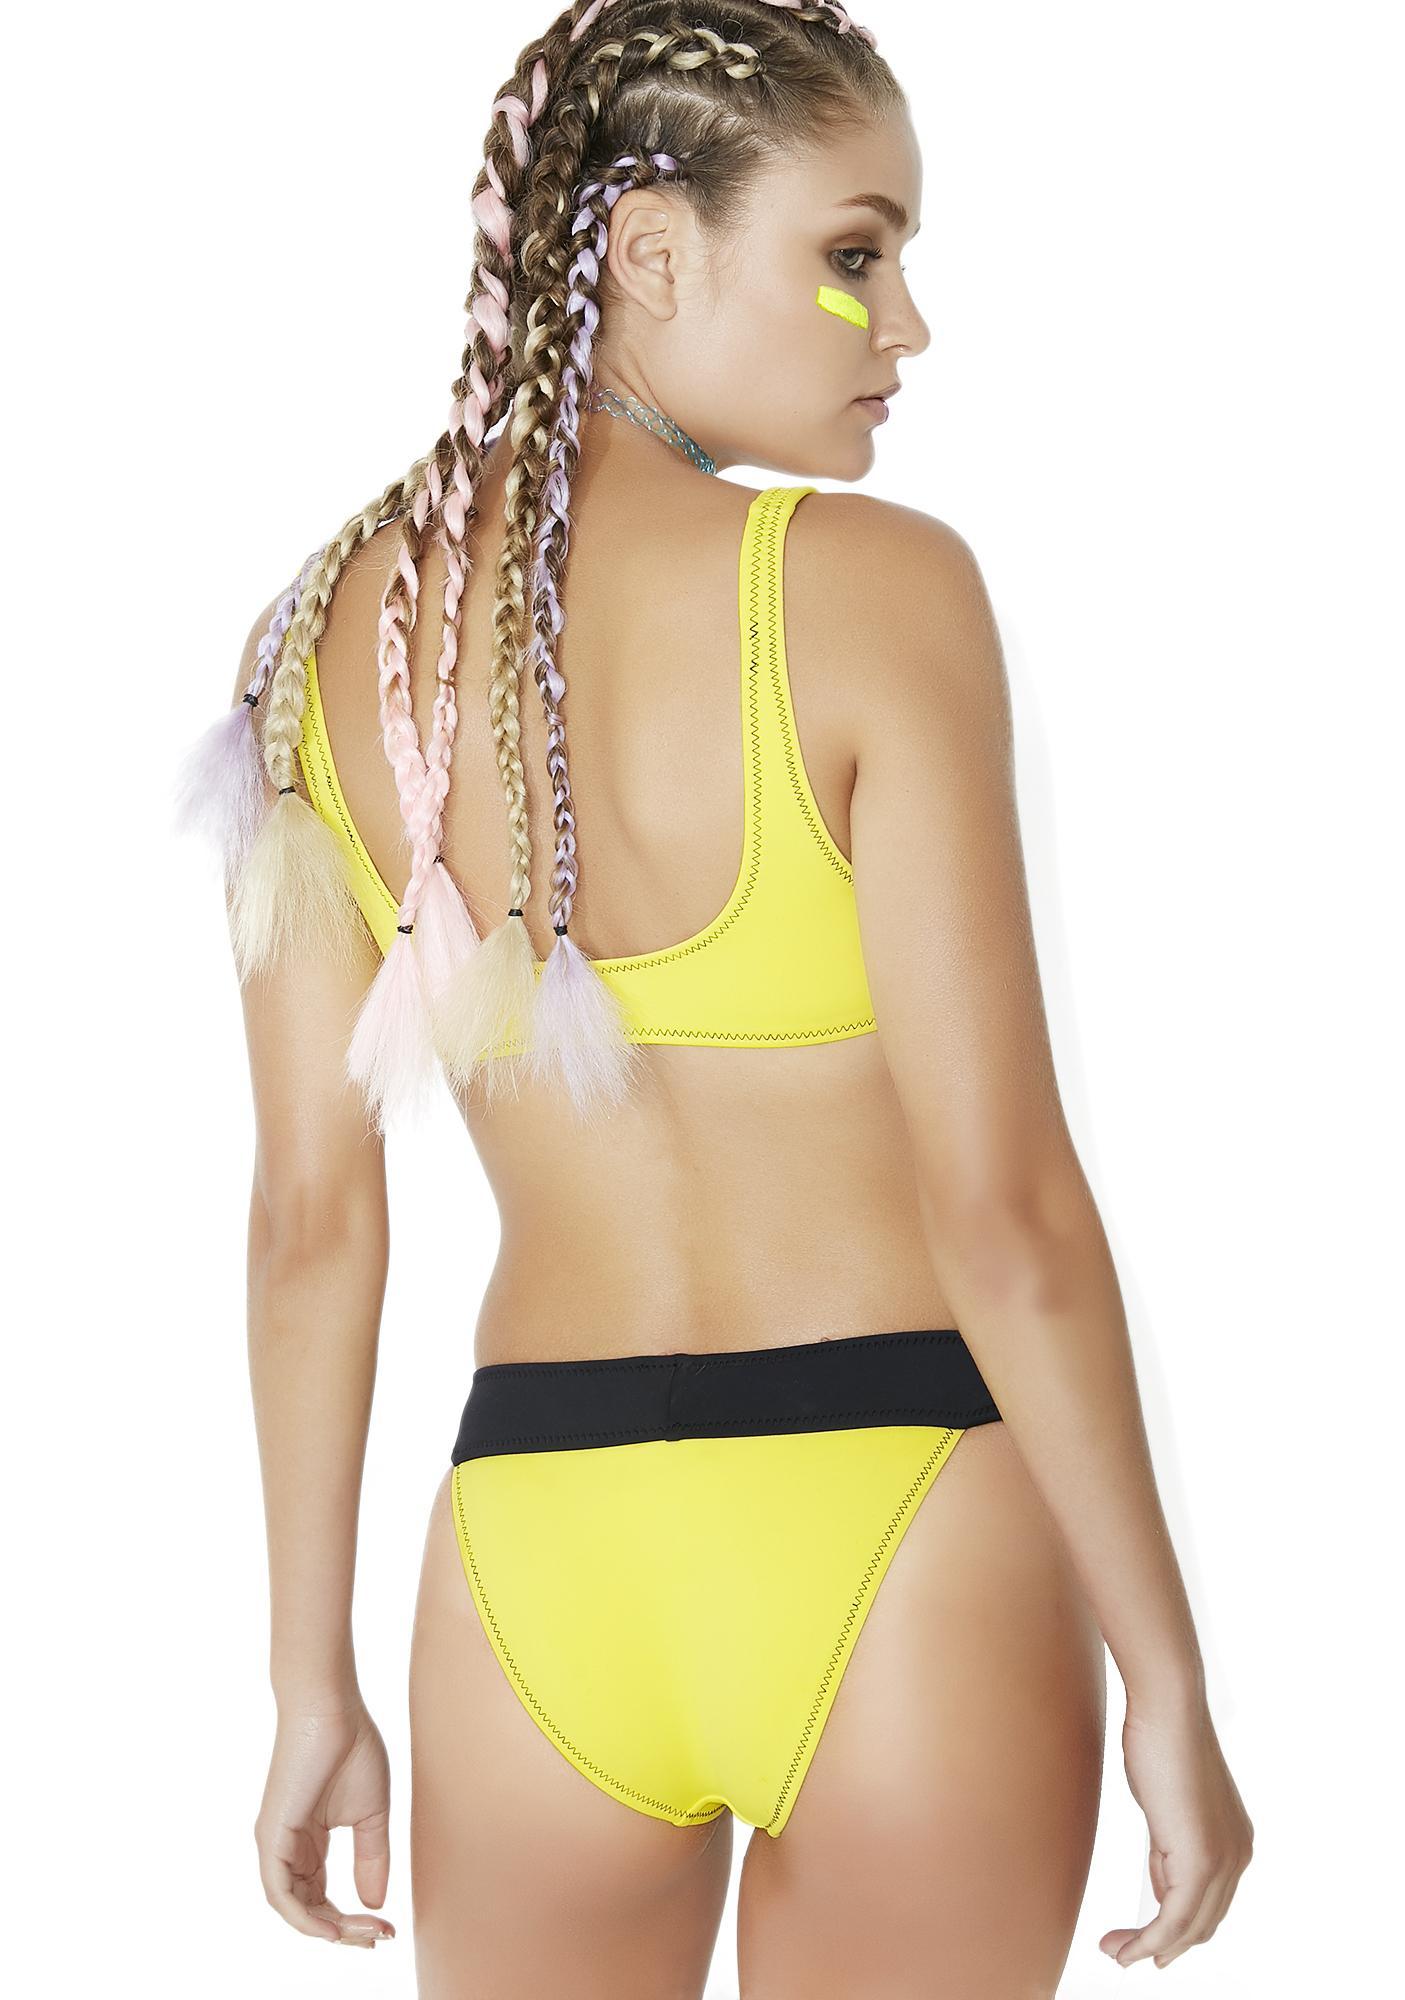 Body Glove Straight Up Bikini Bottoms